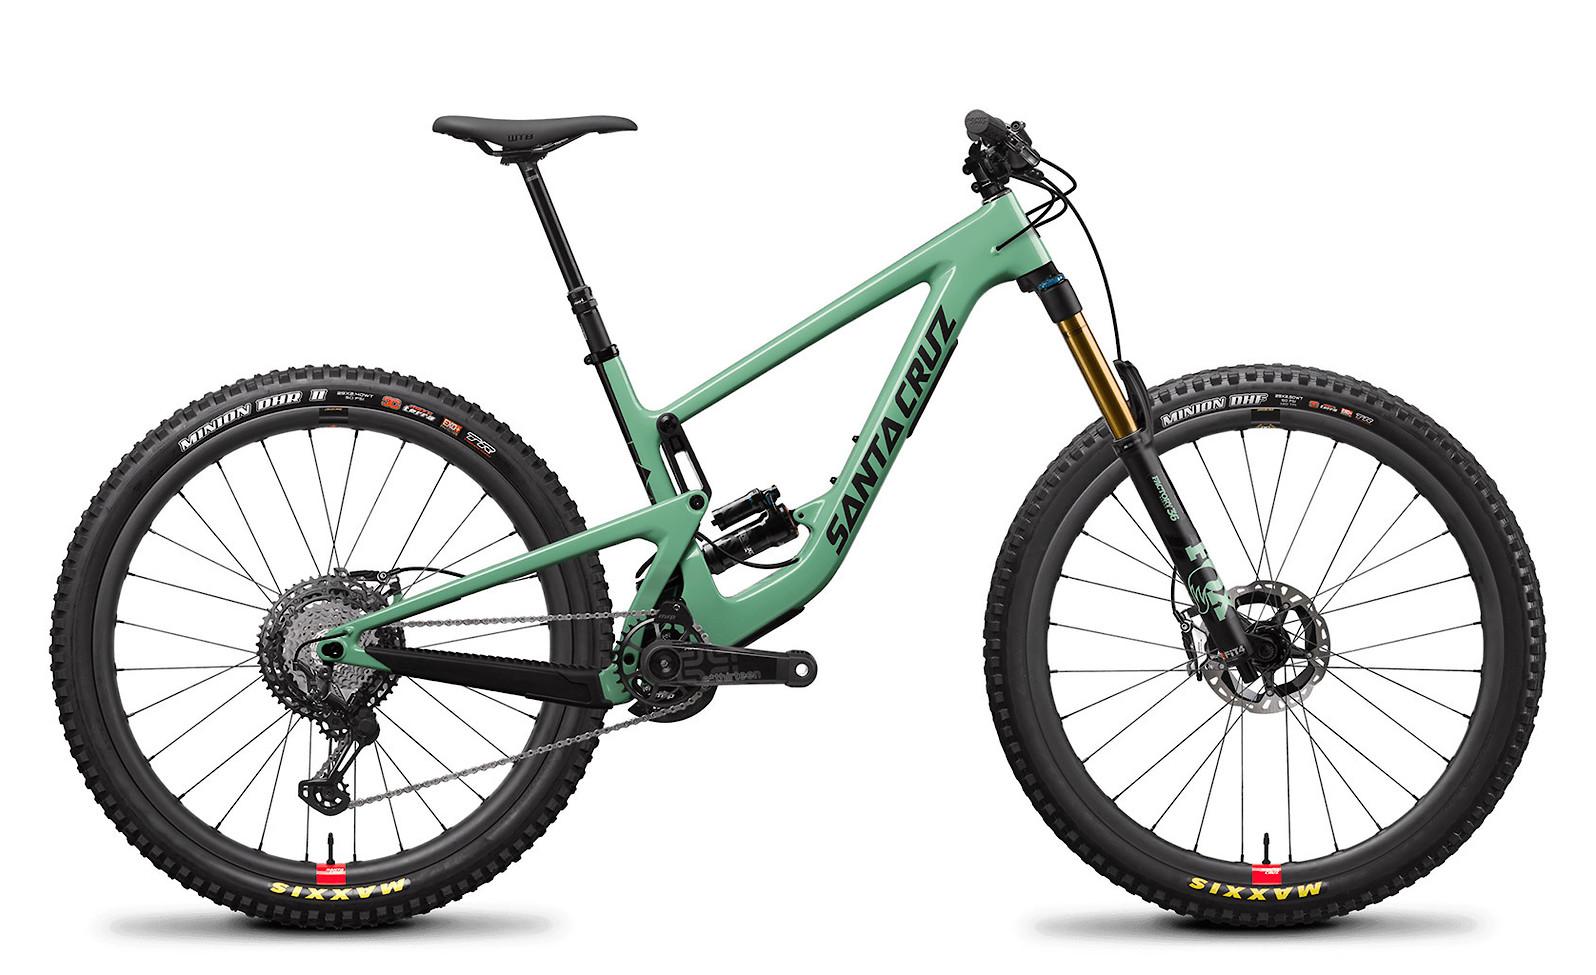 2019 Santa Cruz Megatower CC XTR 29 Reserve Bike